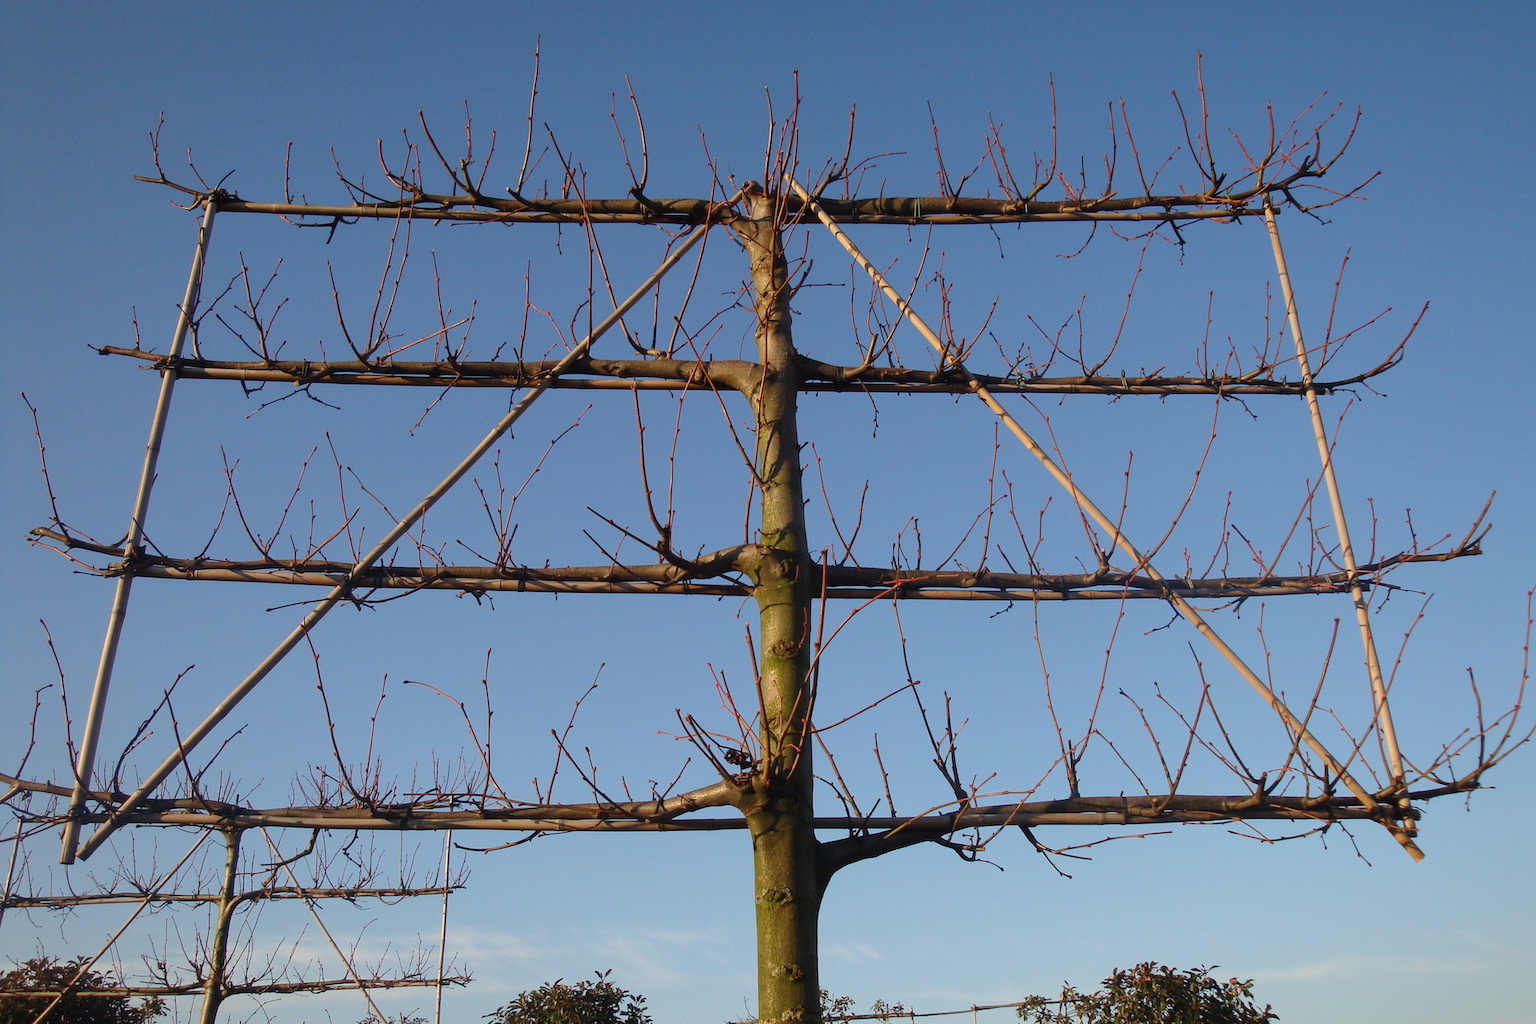 Tilia x europaea 'Pallida' espalier pleached Lime tree in winter